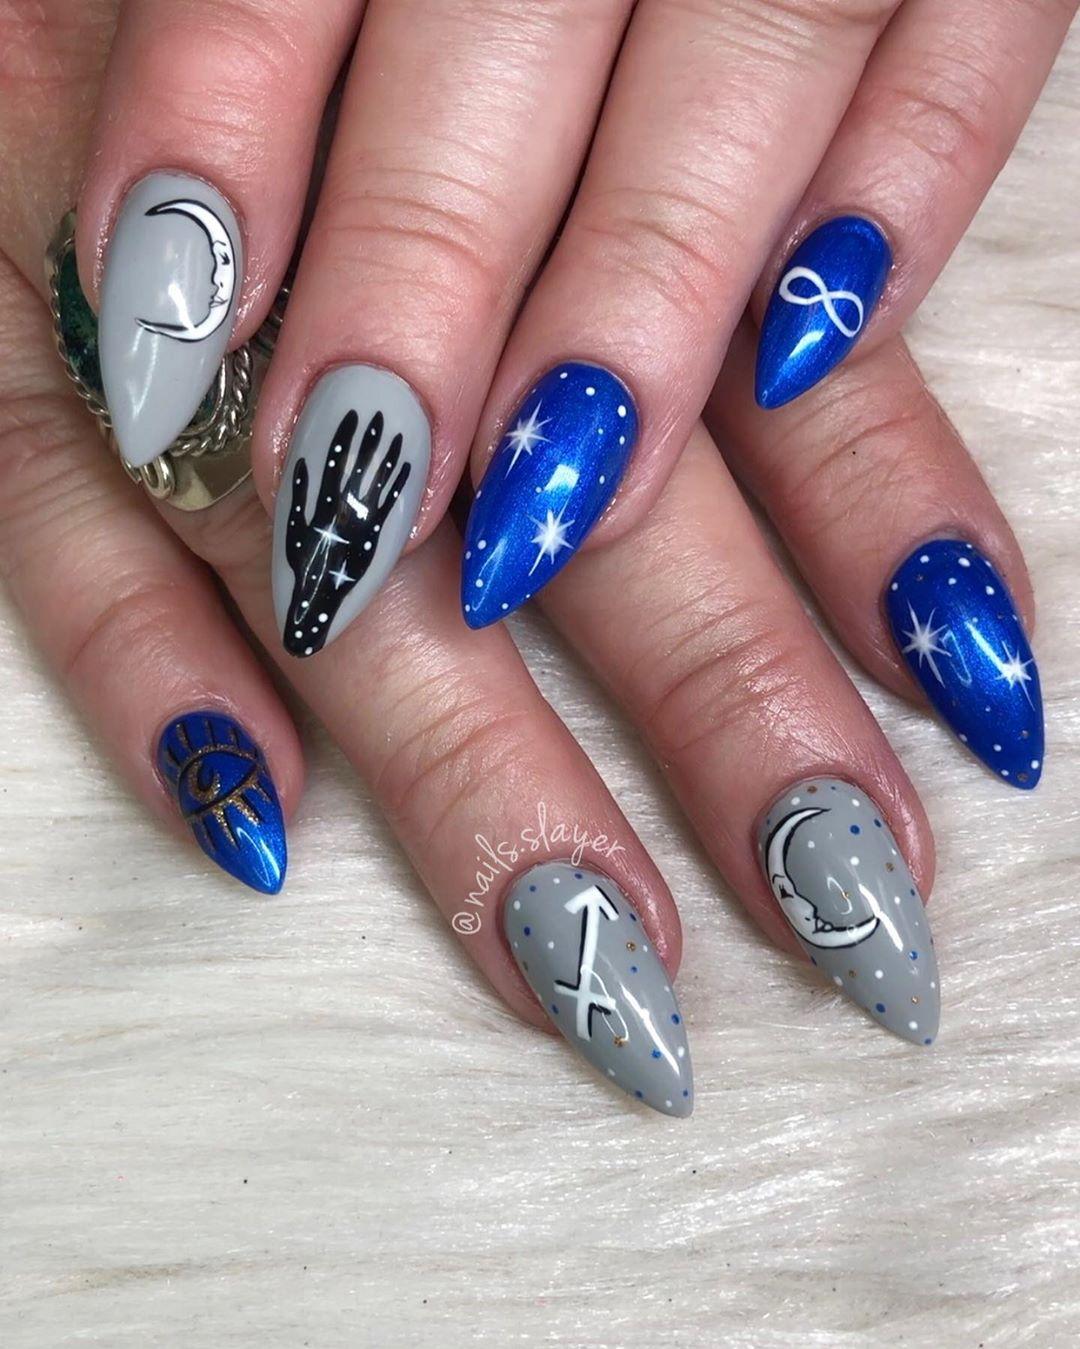 Incredible image of zodiac nails idea